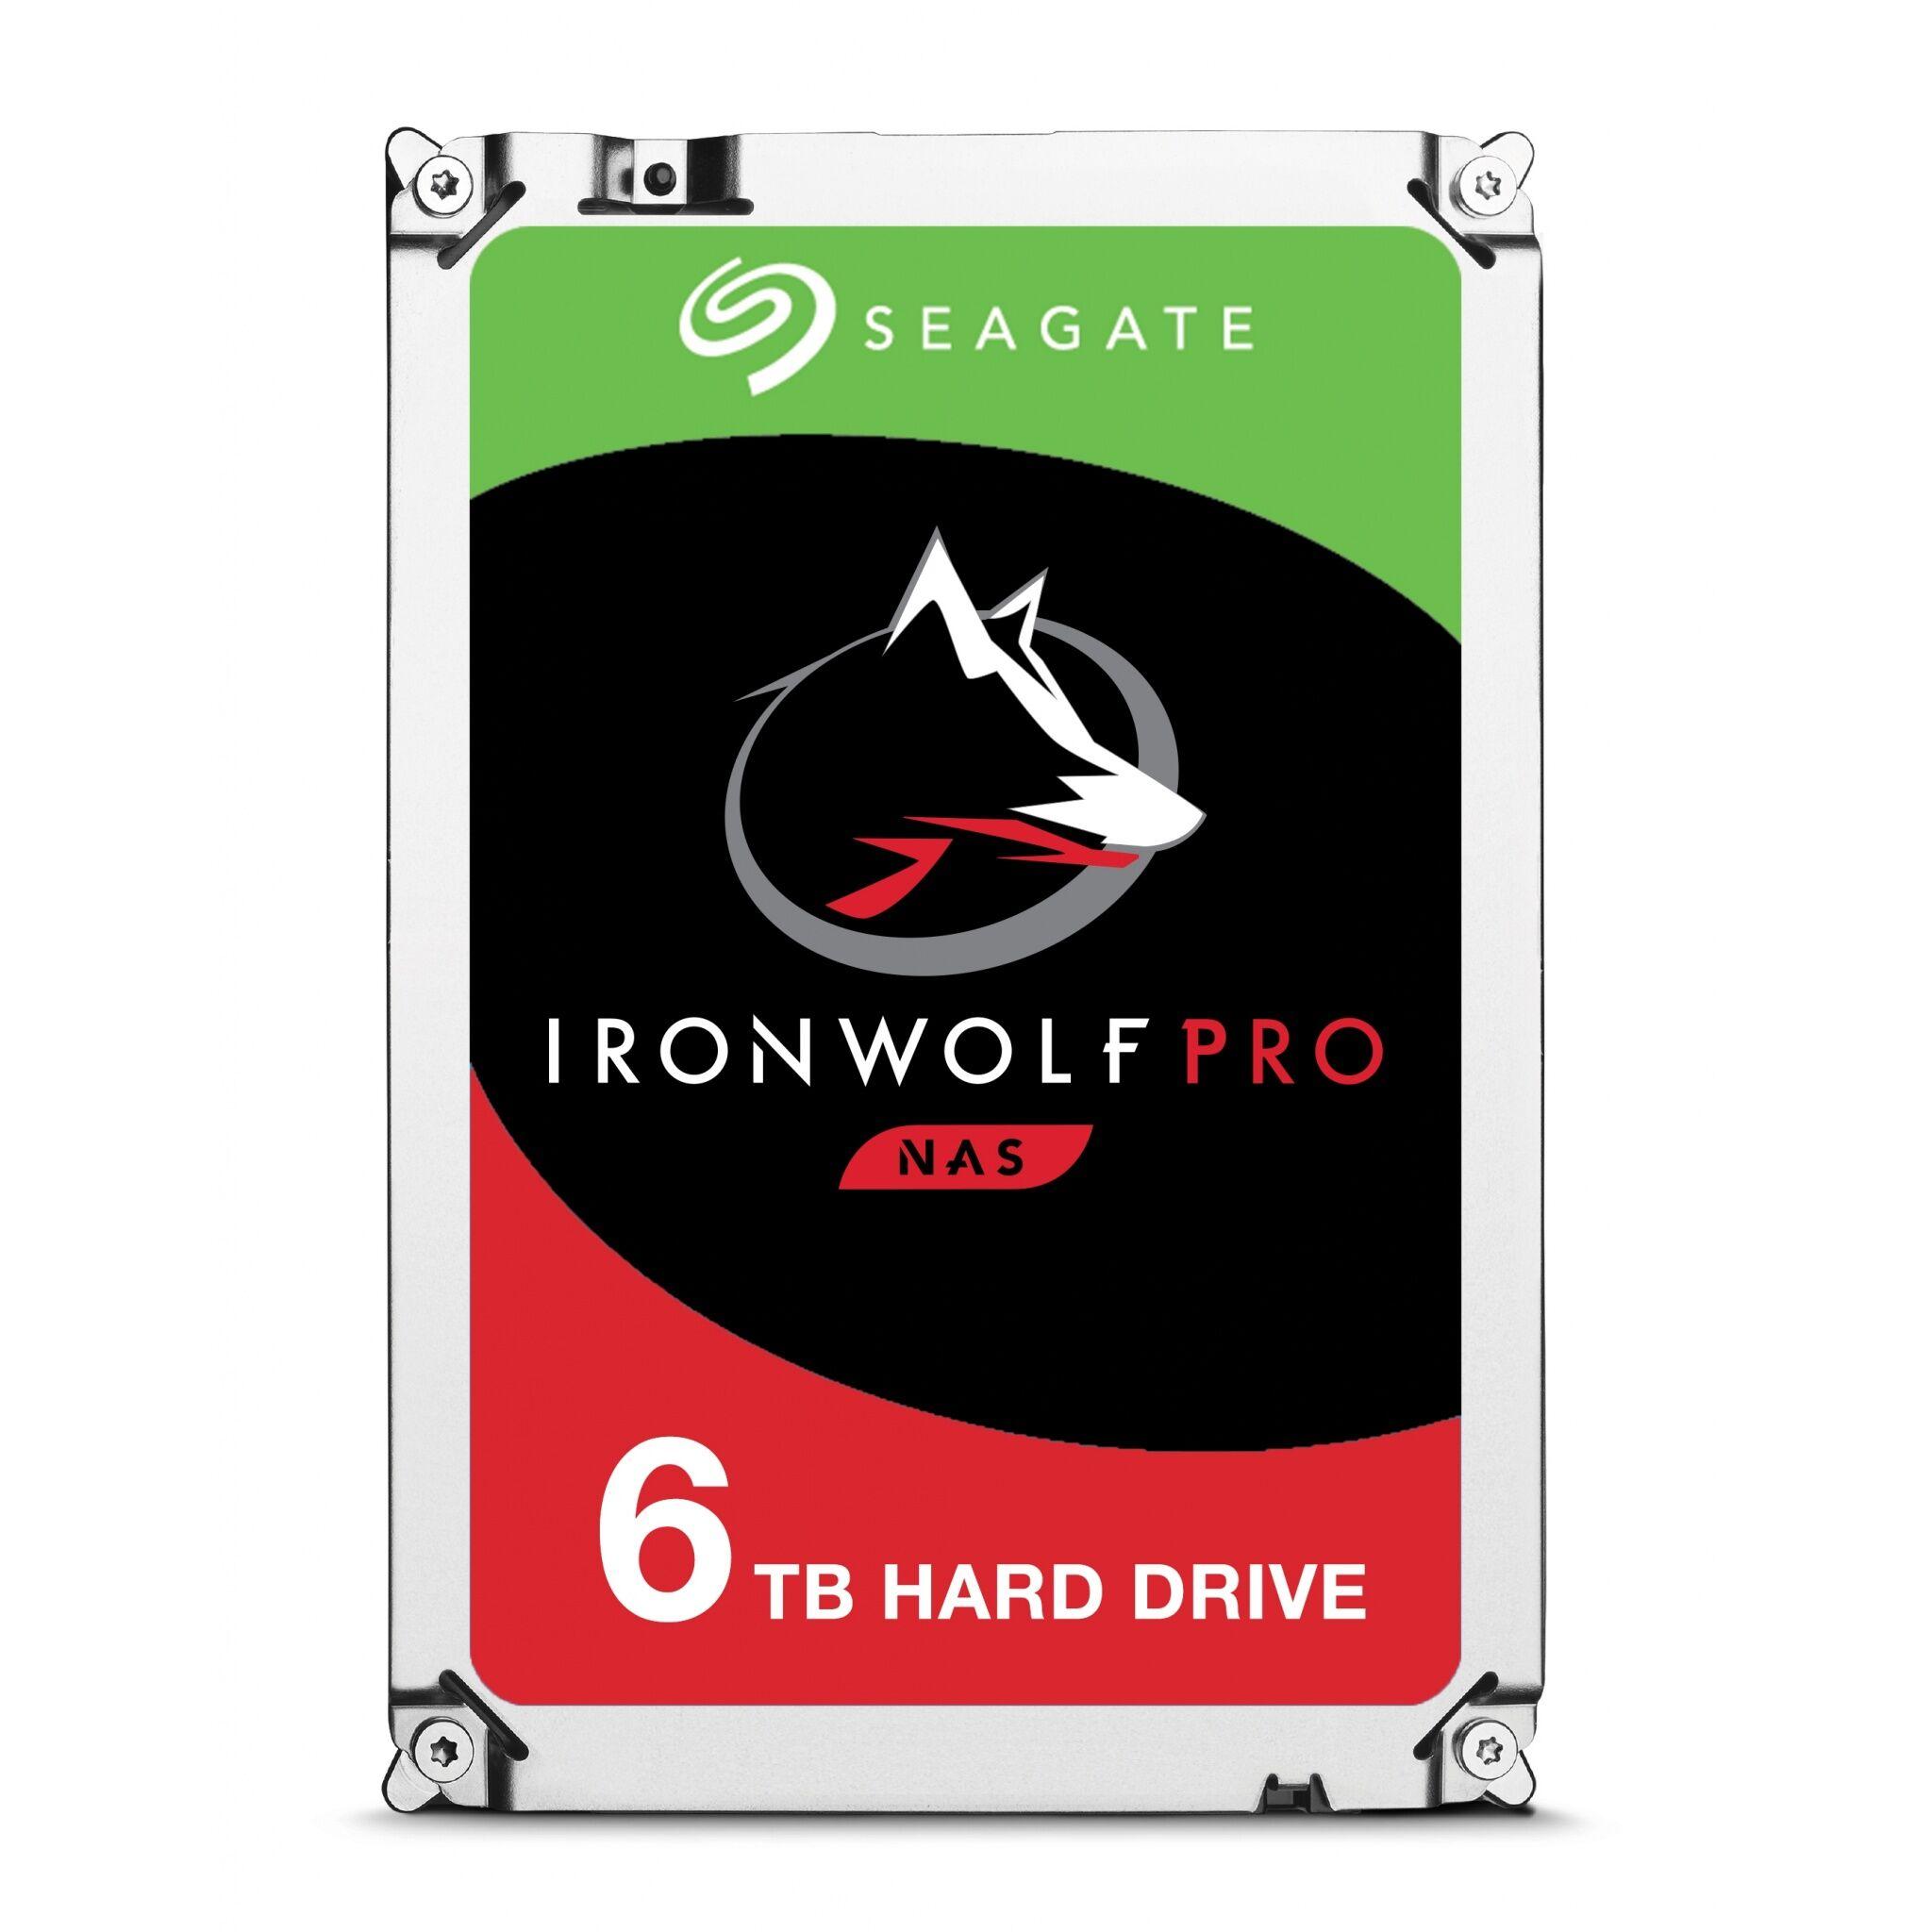 Seagate 6TB Seagate IronWolf Pro NAS 3.5-inch 7200RPM SATA III 6Gbps 256MB Cache Internal Hard Drive